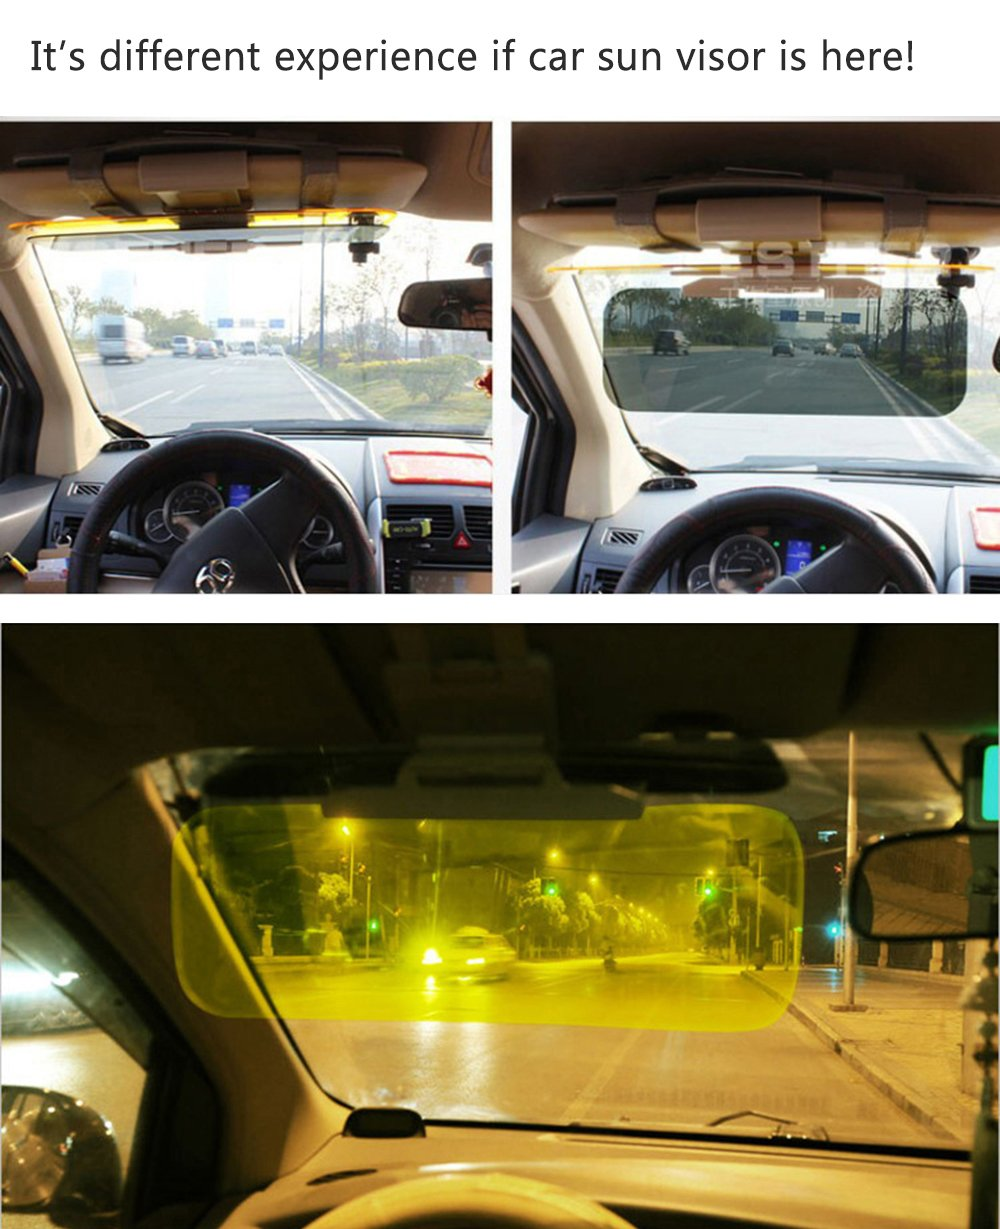 Vnown Transparent Car Sun Visor Extenderwindshield 1955 Dodge Truck Day And Night Anti Glare 2 In 1 Automobile Sunshade Mirror Goggles Shield